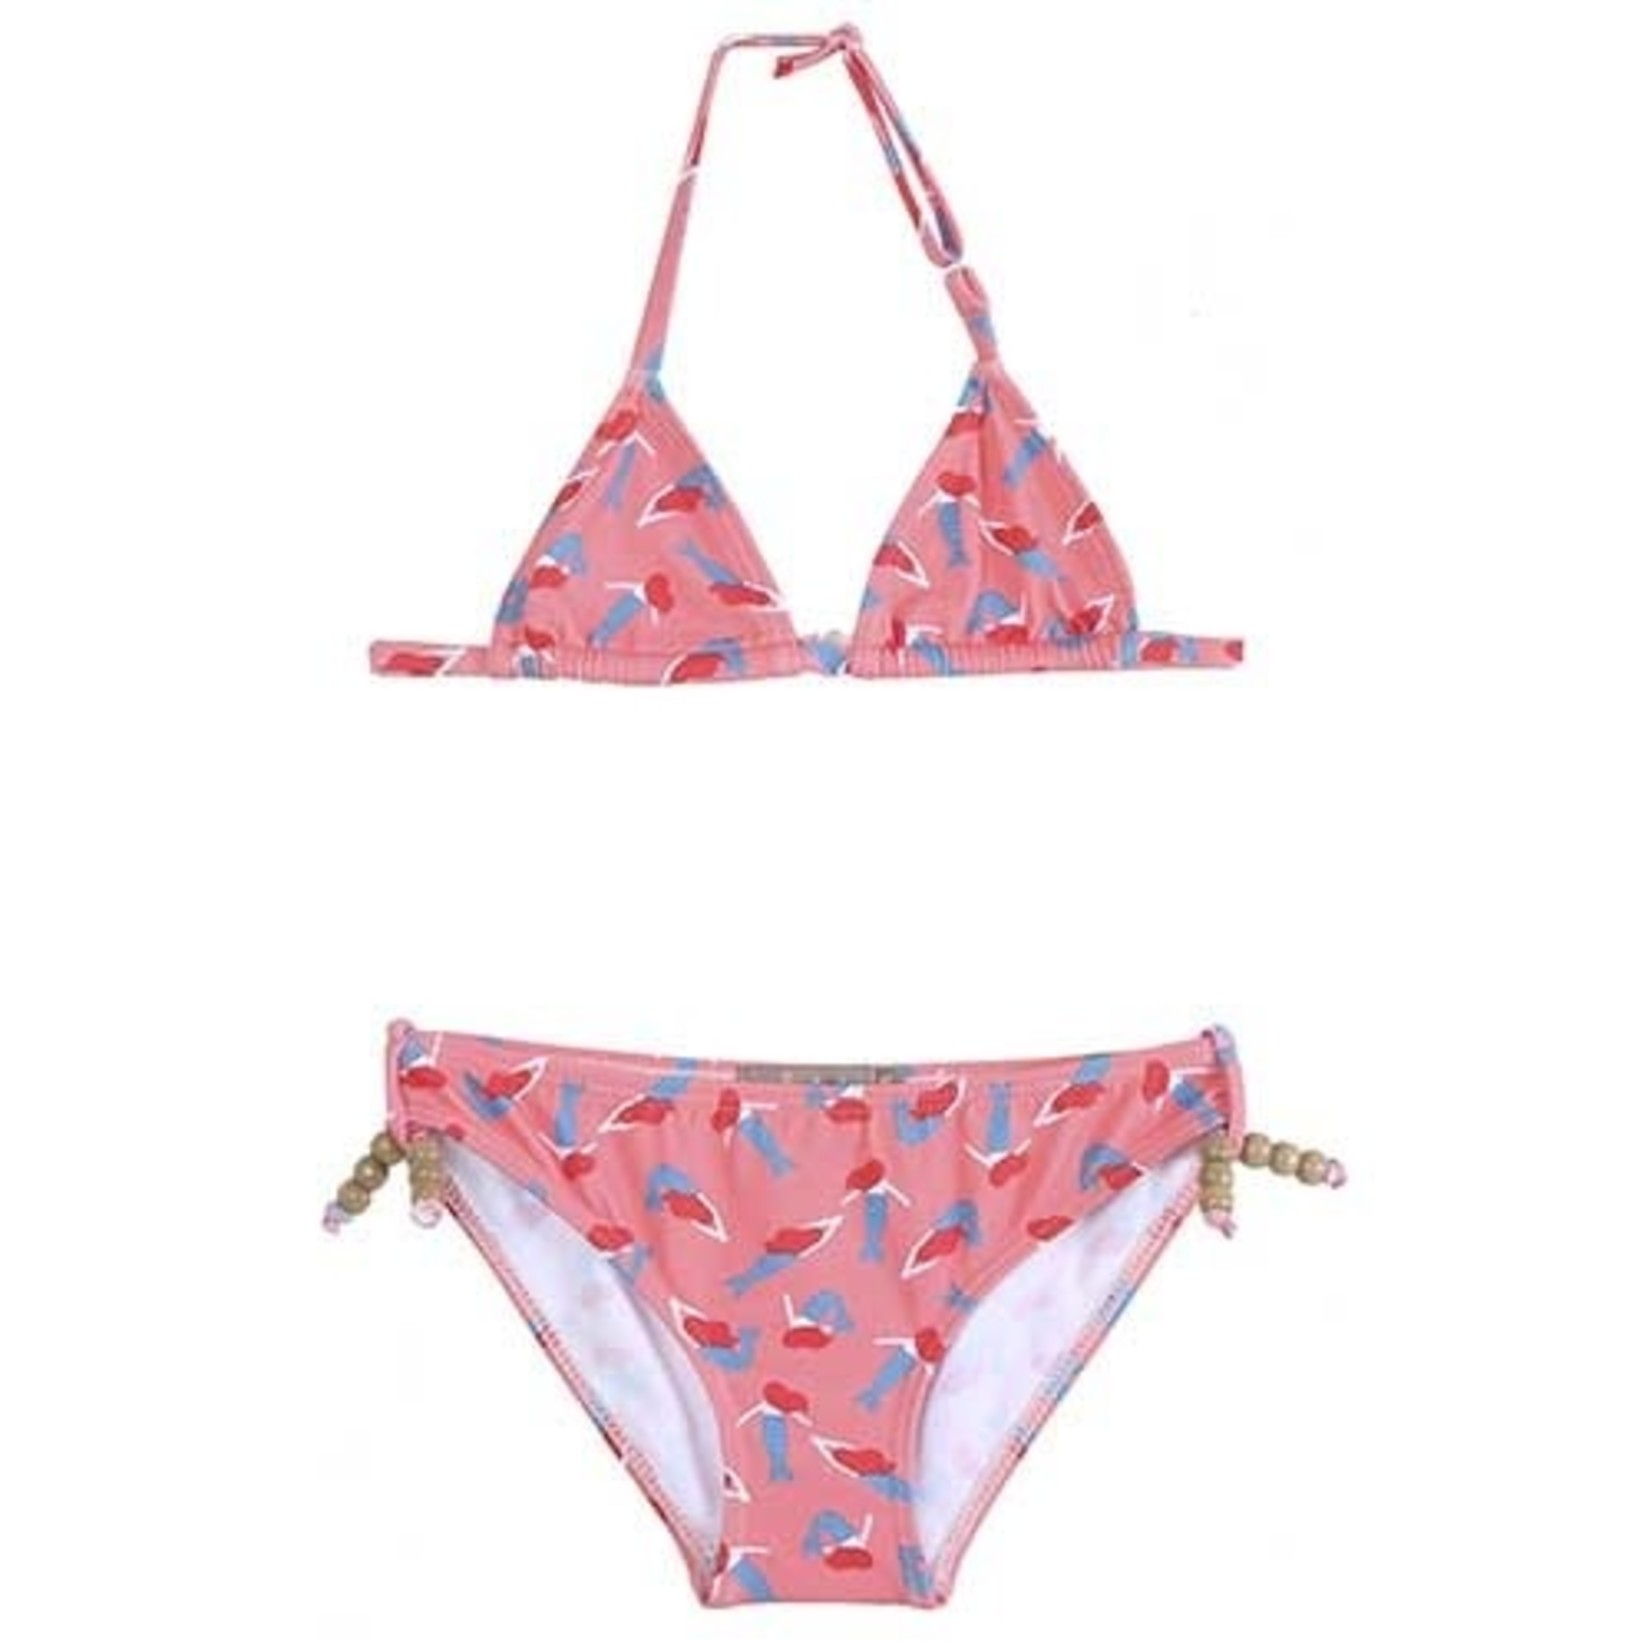 EMILE ET IDA EMILE ET  IDA bikini set